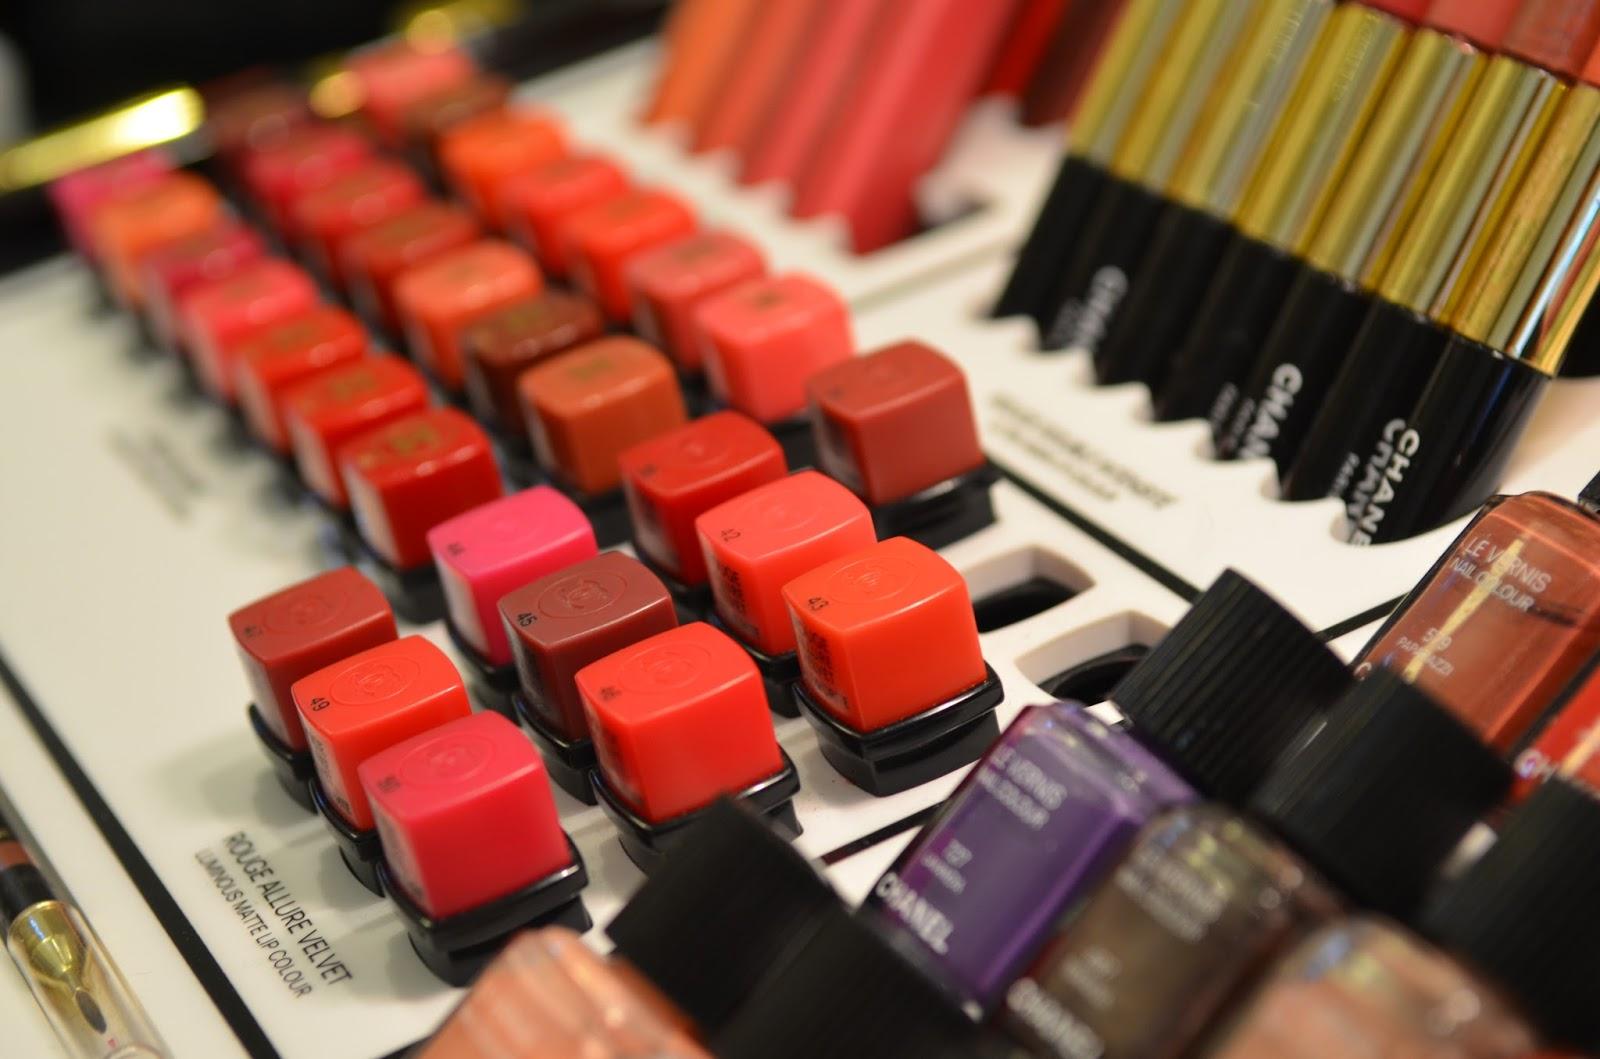 Chanel Rouge Allure Velvet Swatches Comparisons